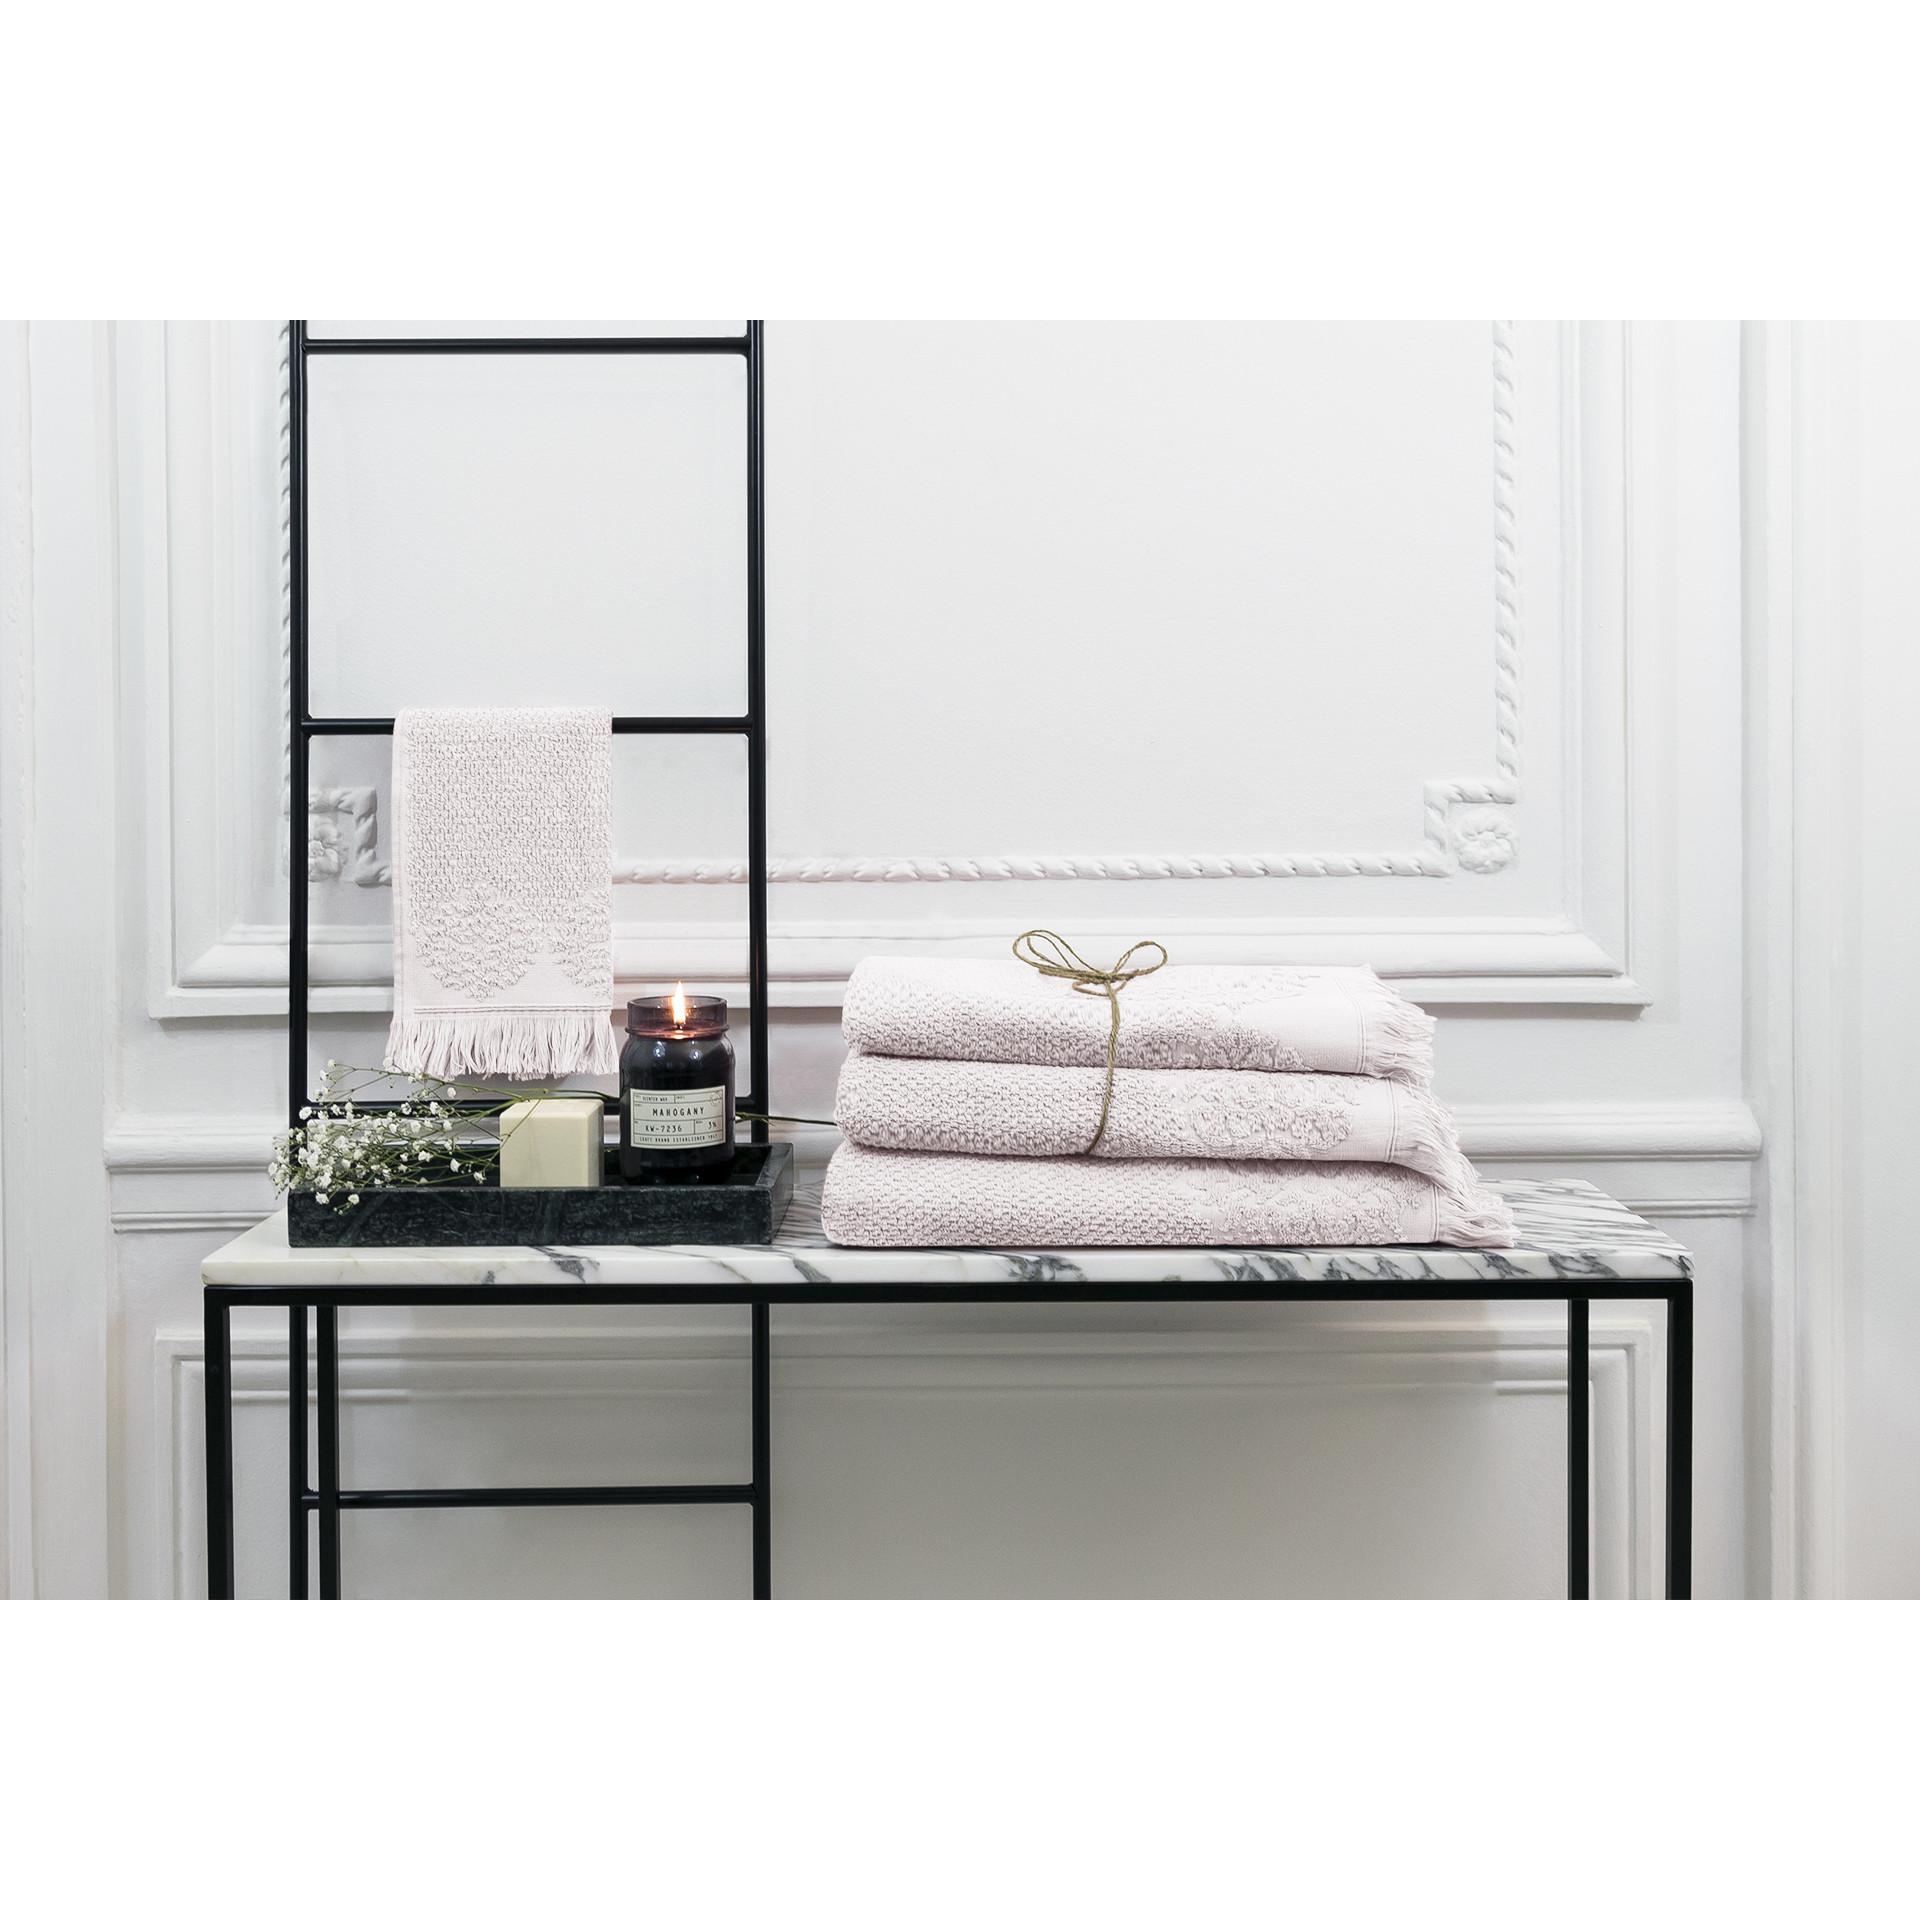 Handtuch Bella 100 x 150 cm | Perle